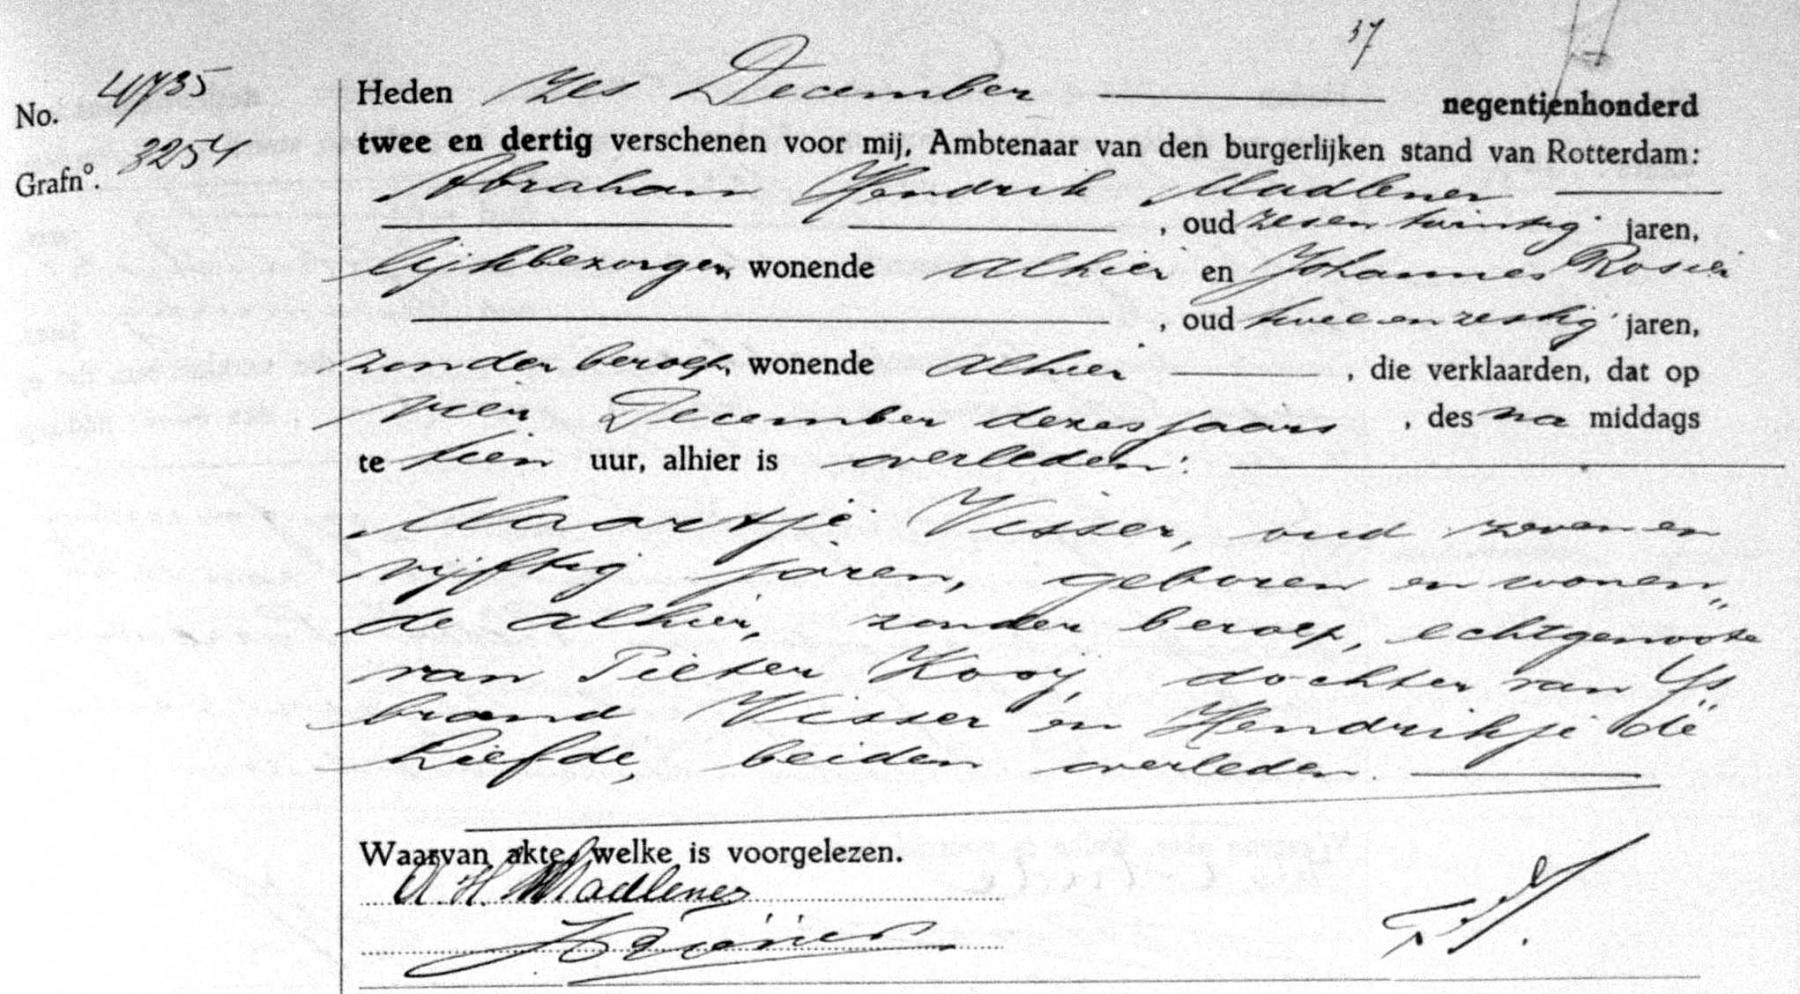 Visser-Maartje-Overlijdensakte-04-12-1932-Rotterdam